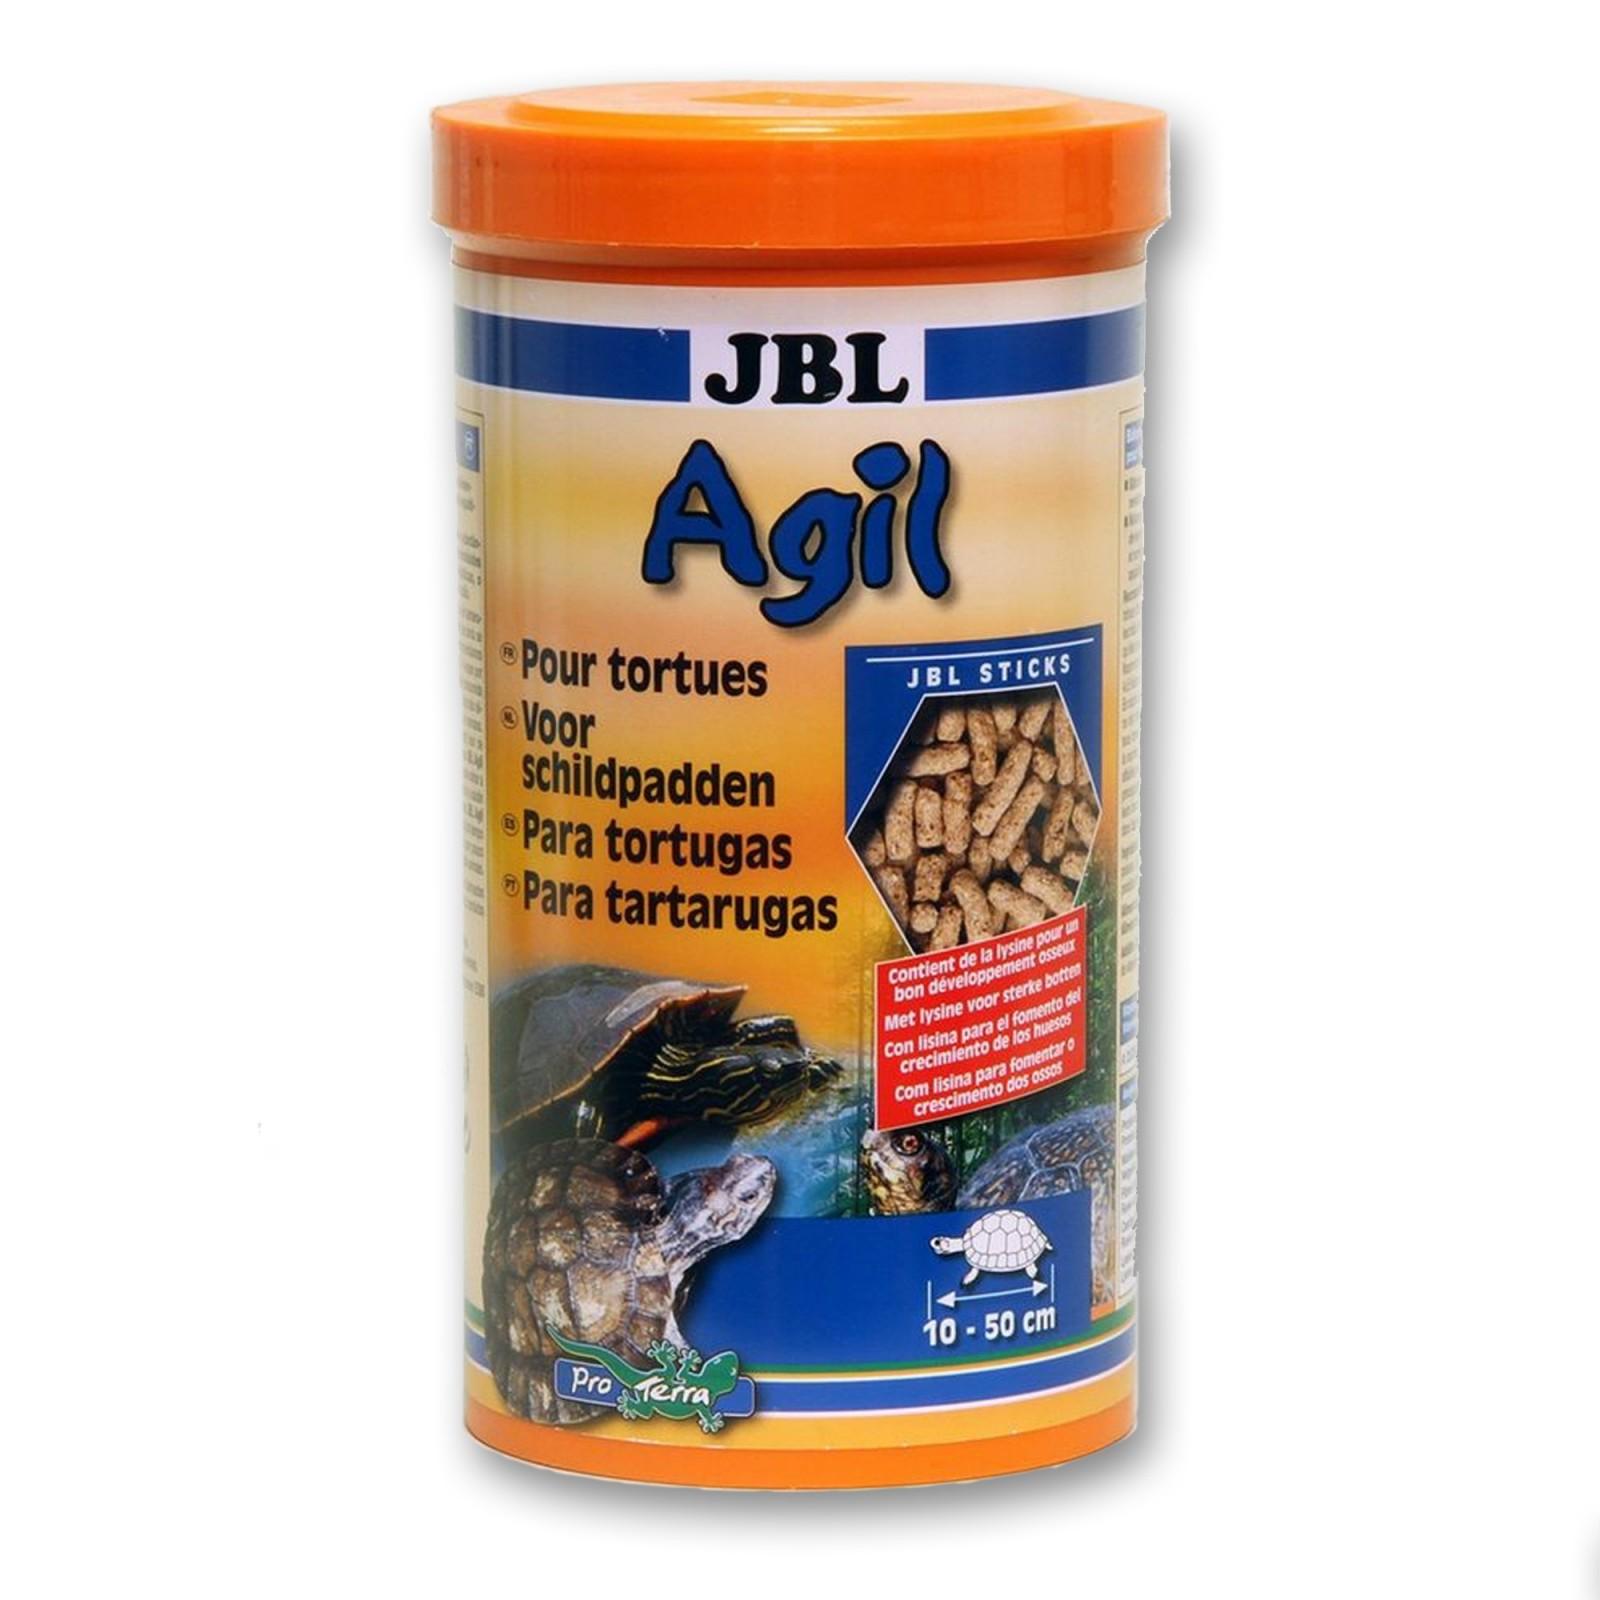 JBL Agil 1 lt mangime con vitamine per tartarughe d'acqua e palude